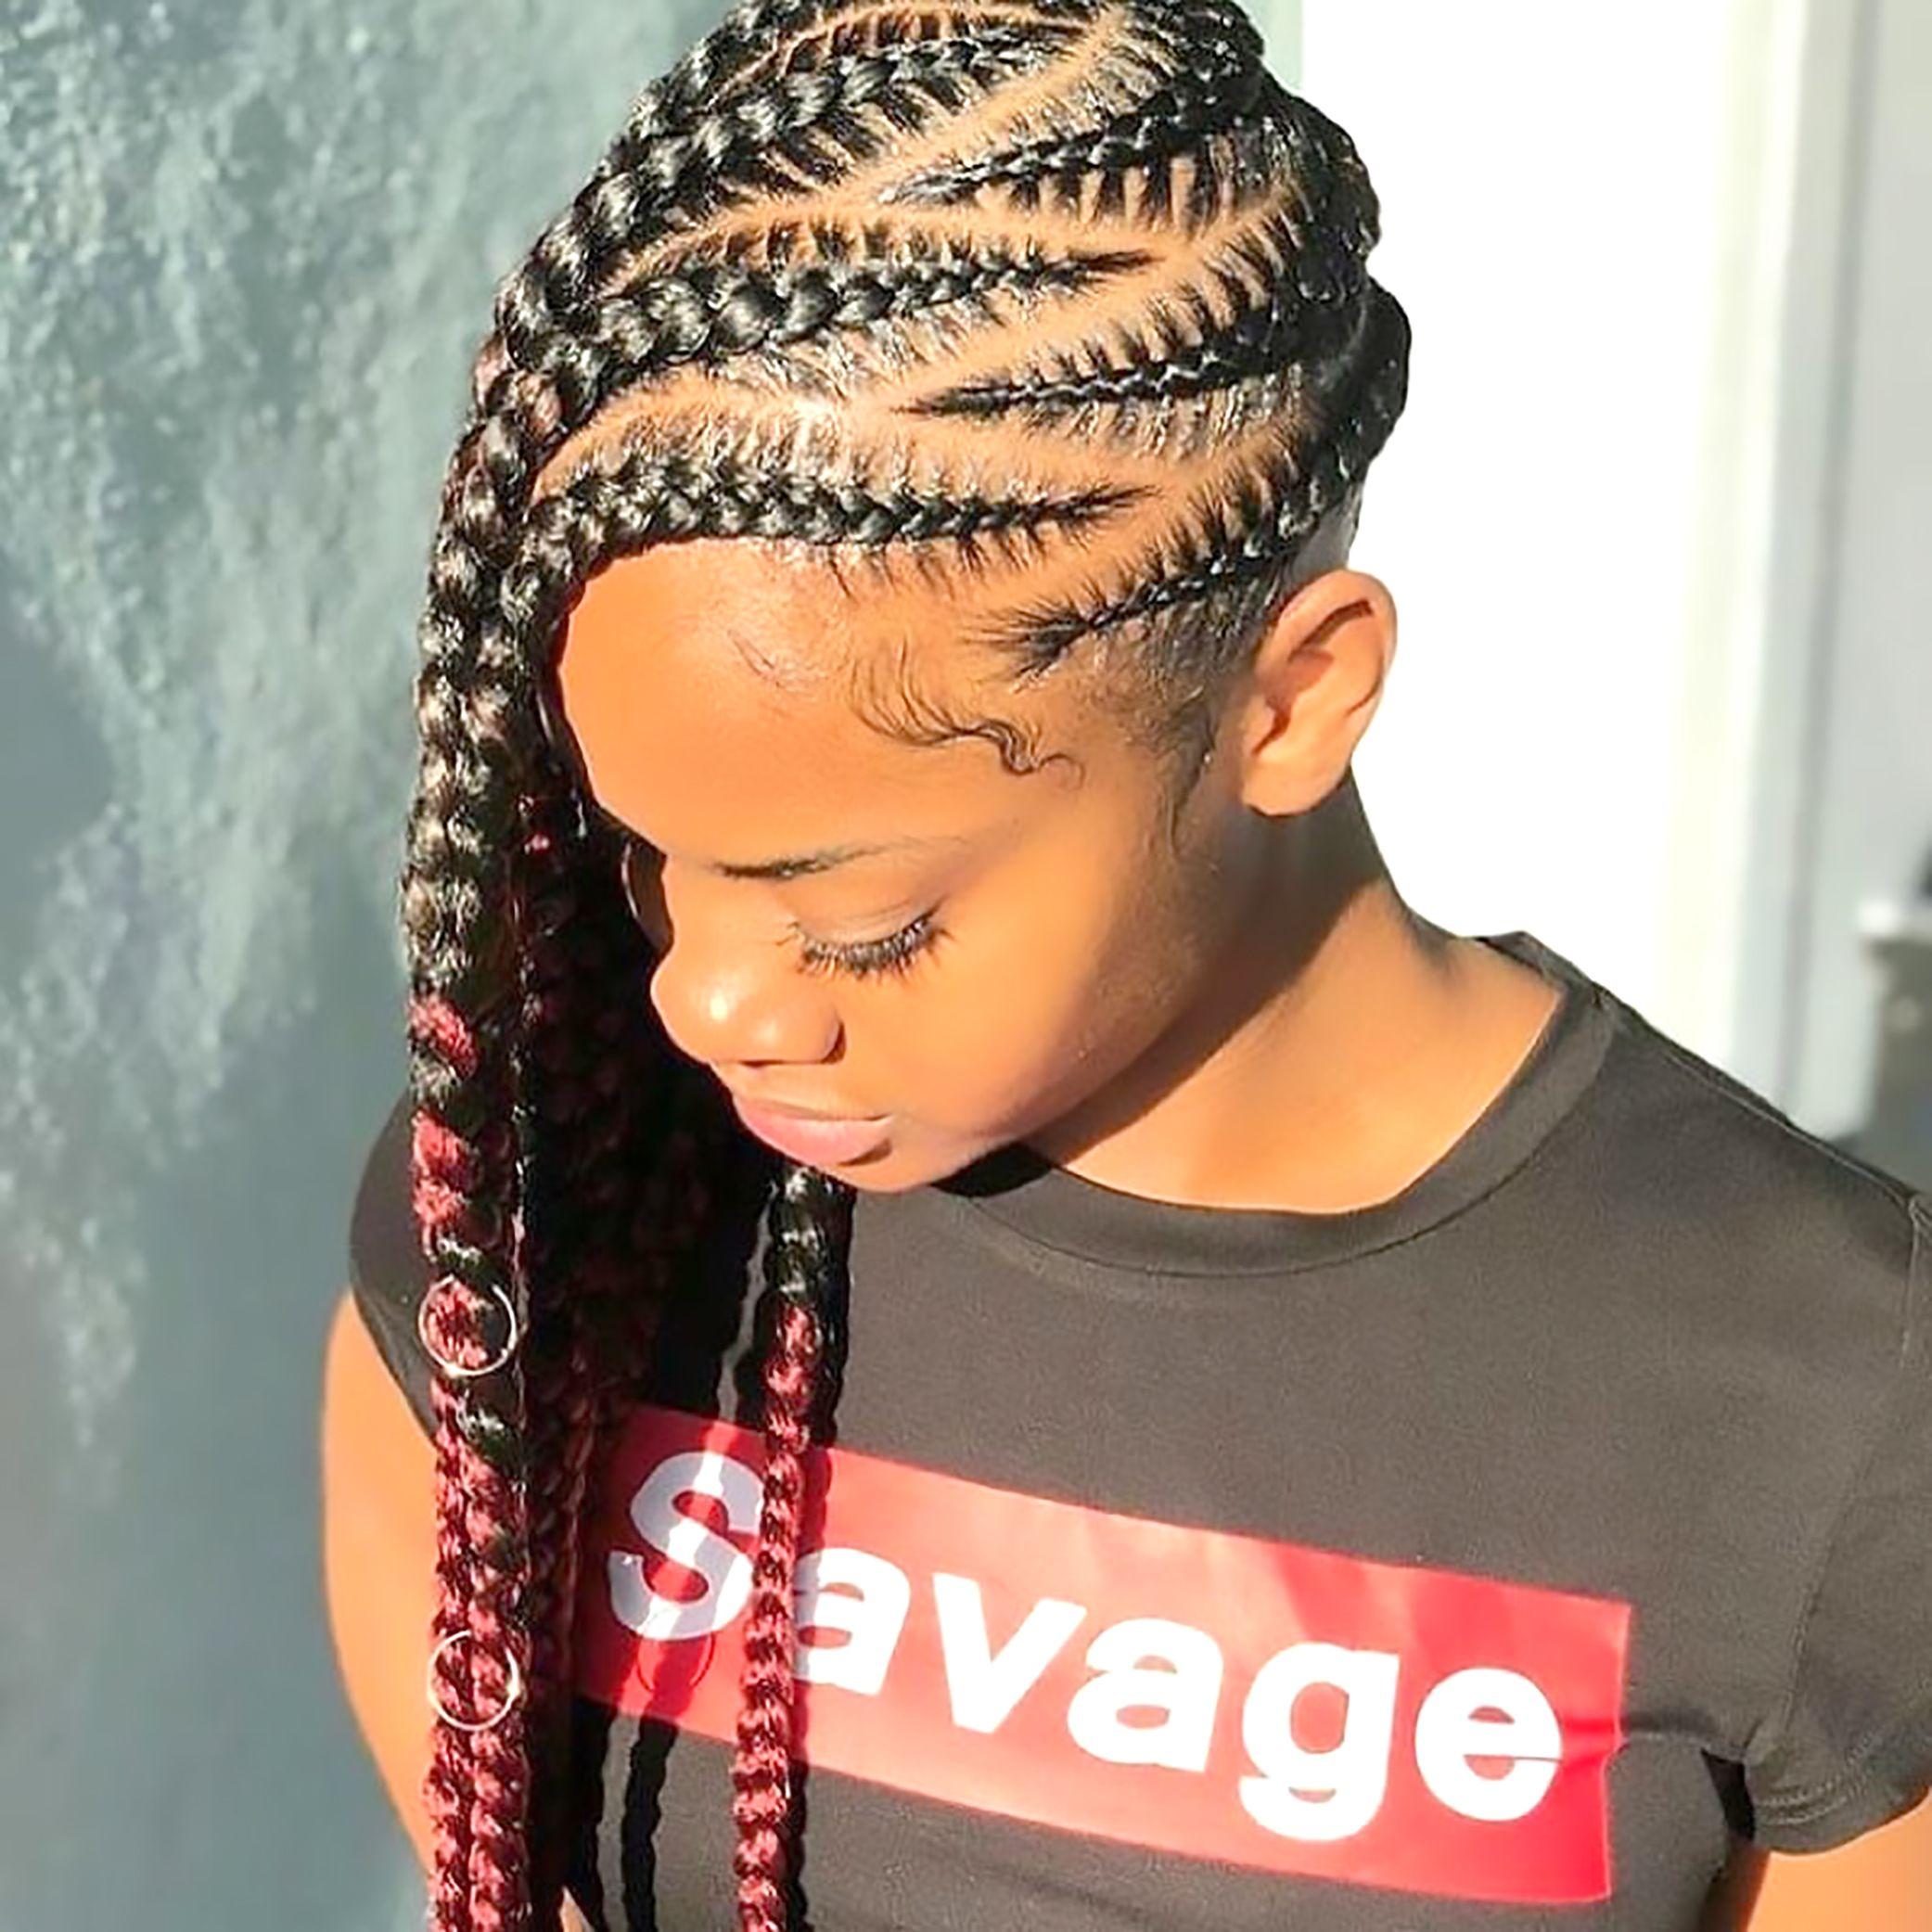 Cornrows Hairstyles For Black Women Cornrows Hairstyles White Cornrows Hairstyles For Lemonade Braids Hairstyles Braided Hairstyles Feed In Braids Hairstyles